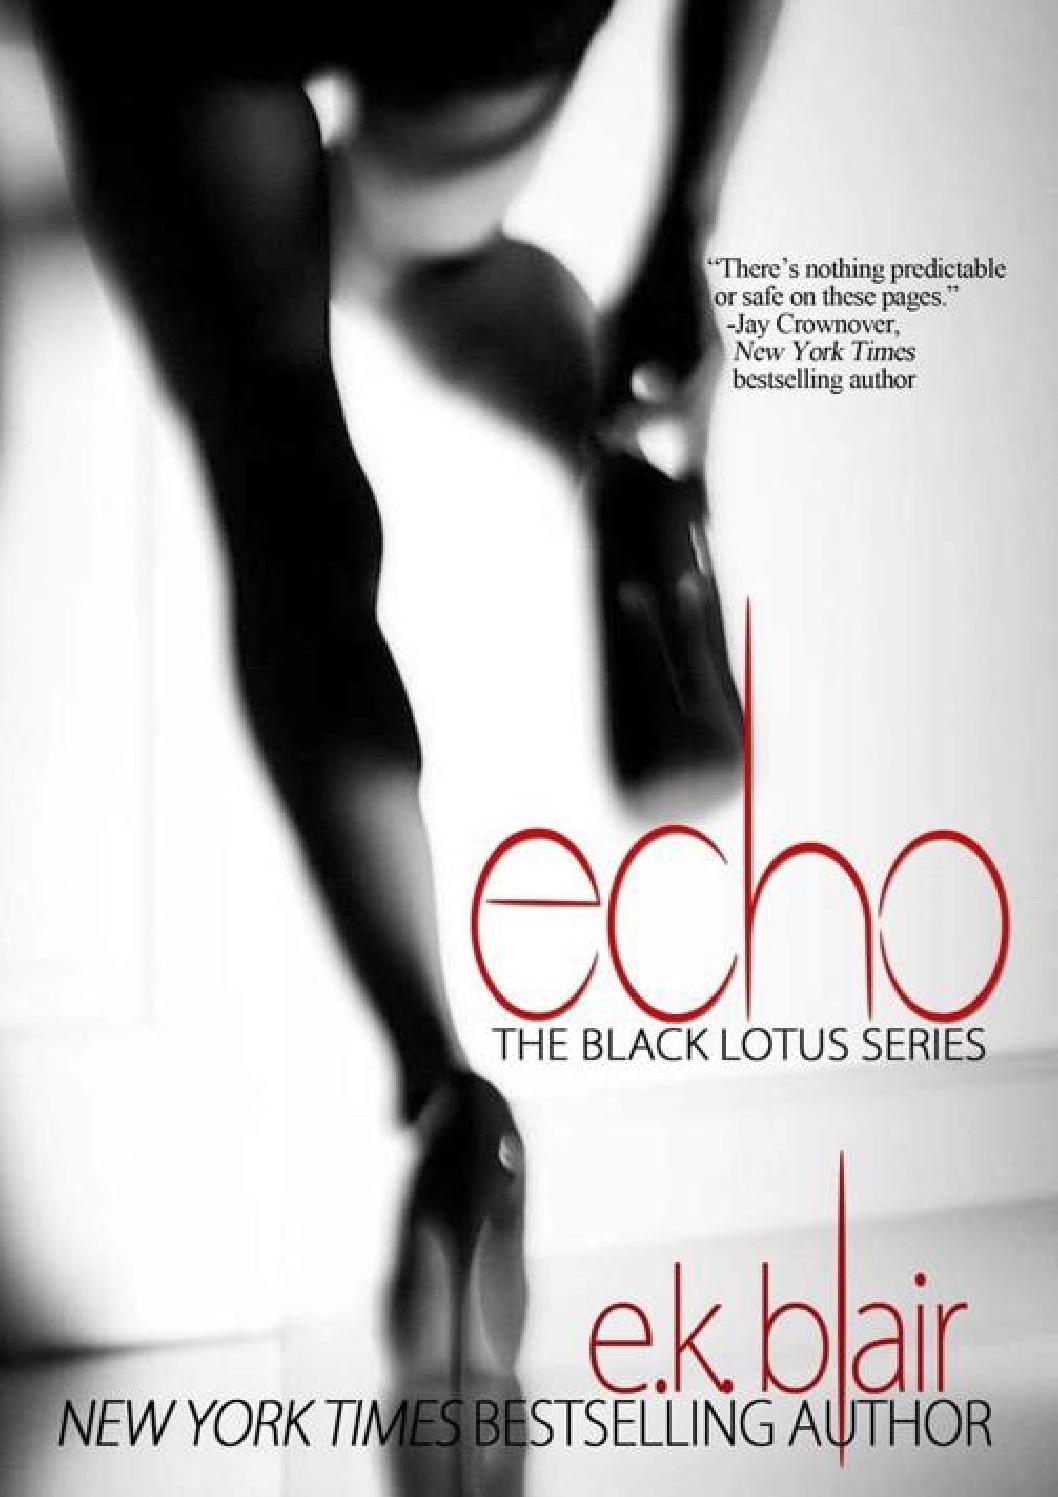 b62ca2966 Serie the black lotus  2 - Echo E k blair by gei z - issuu